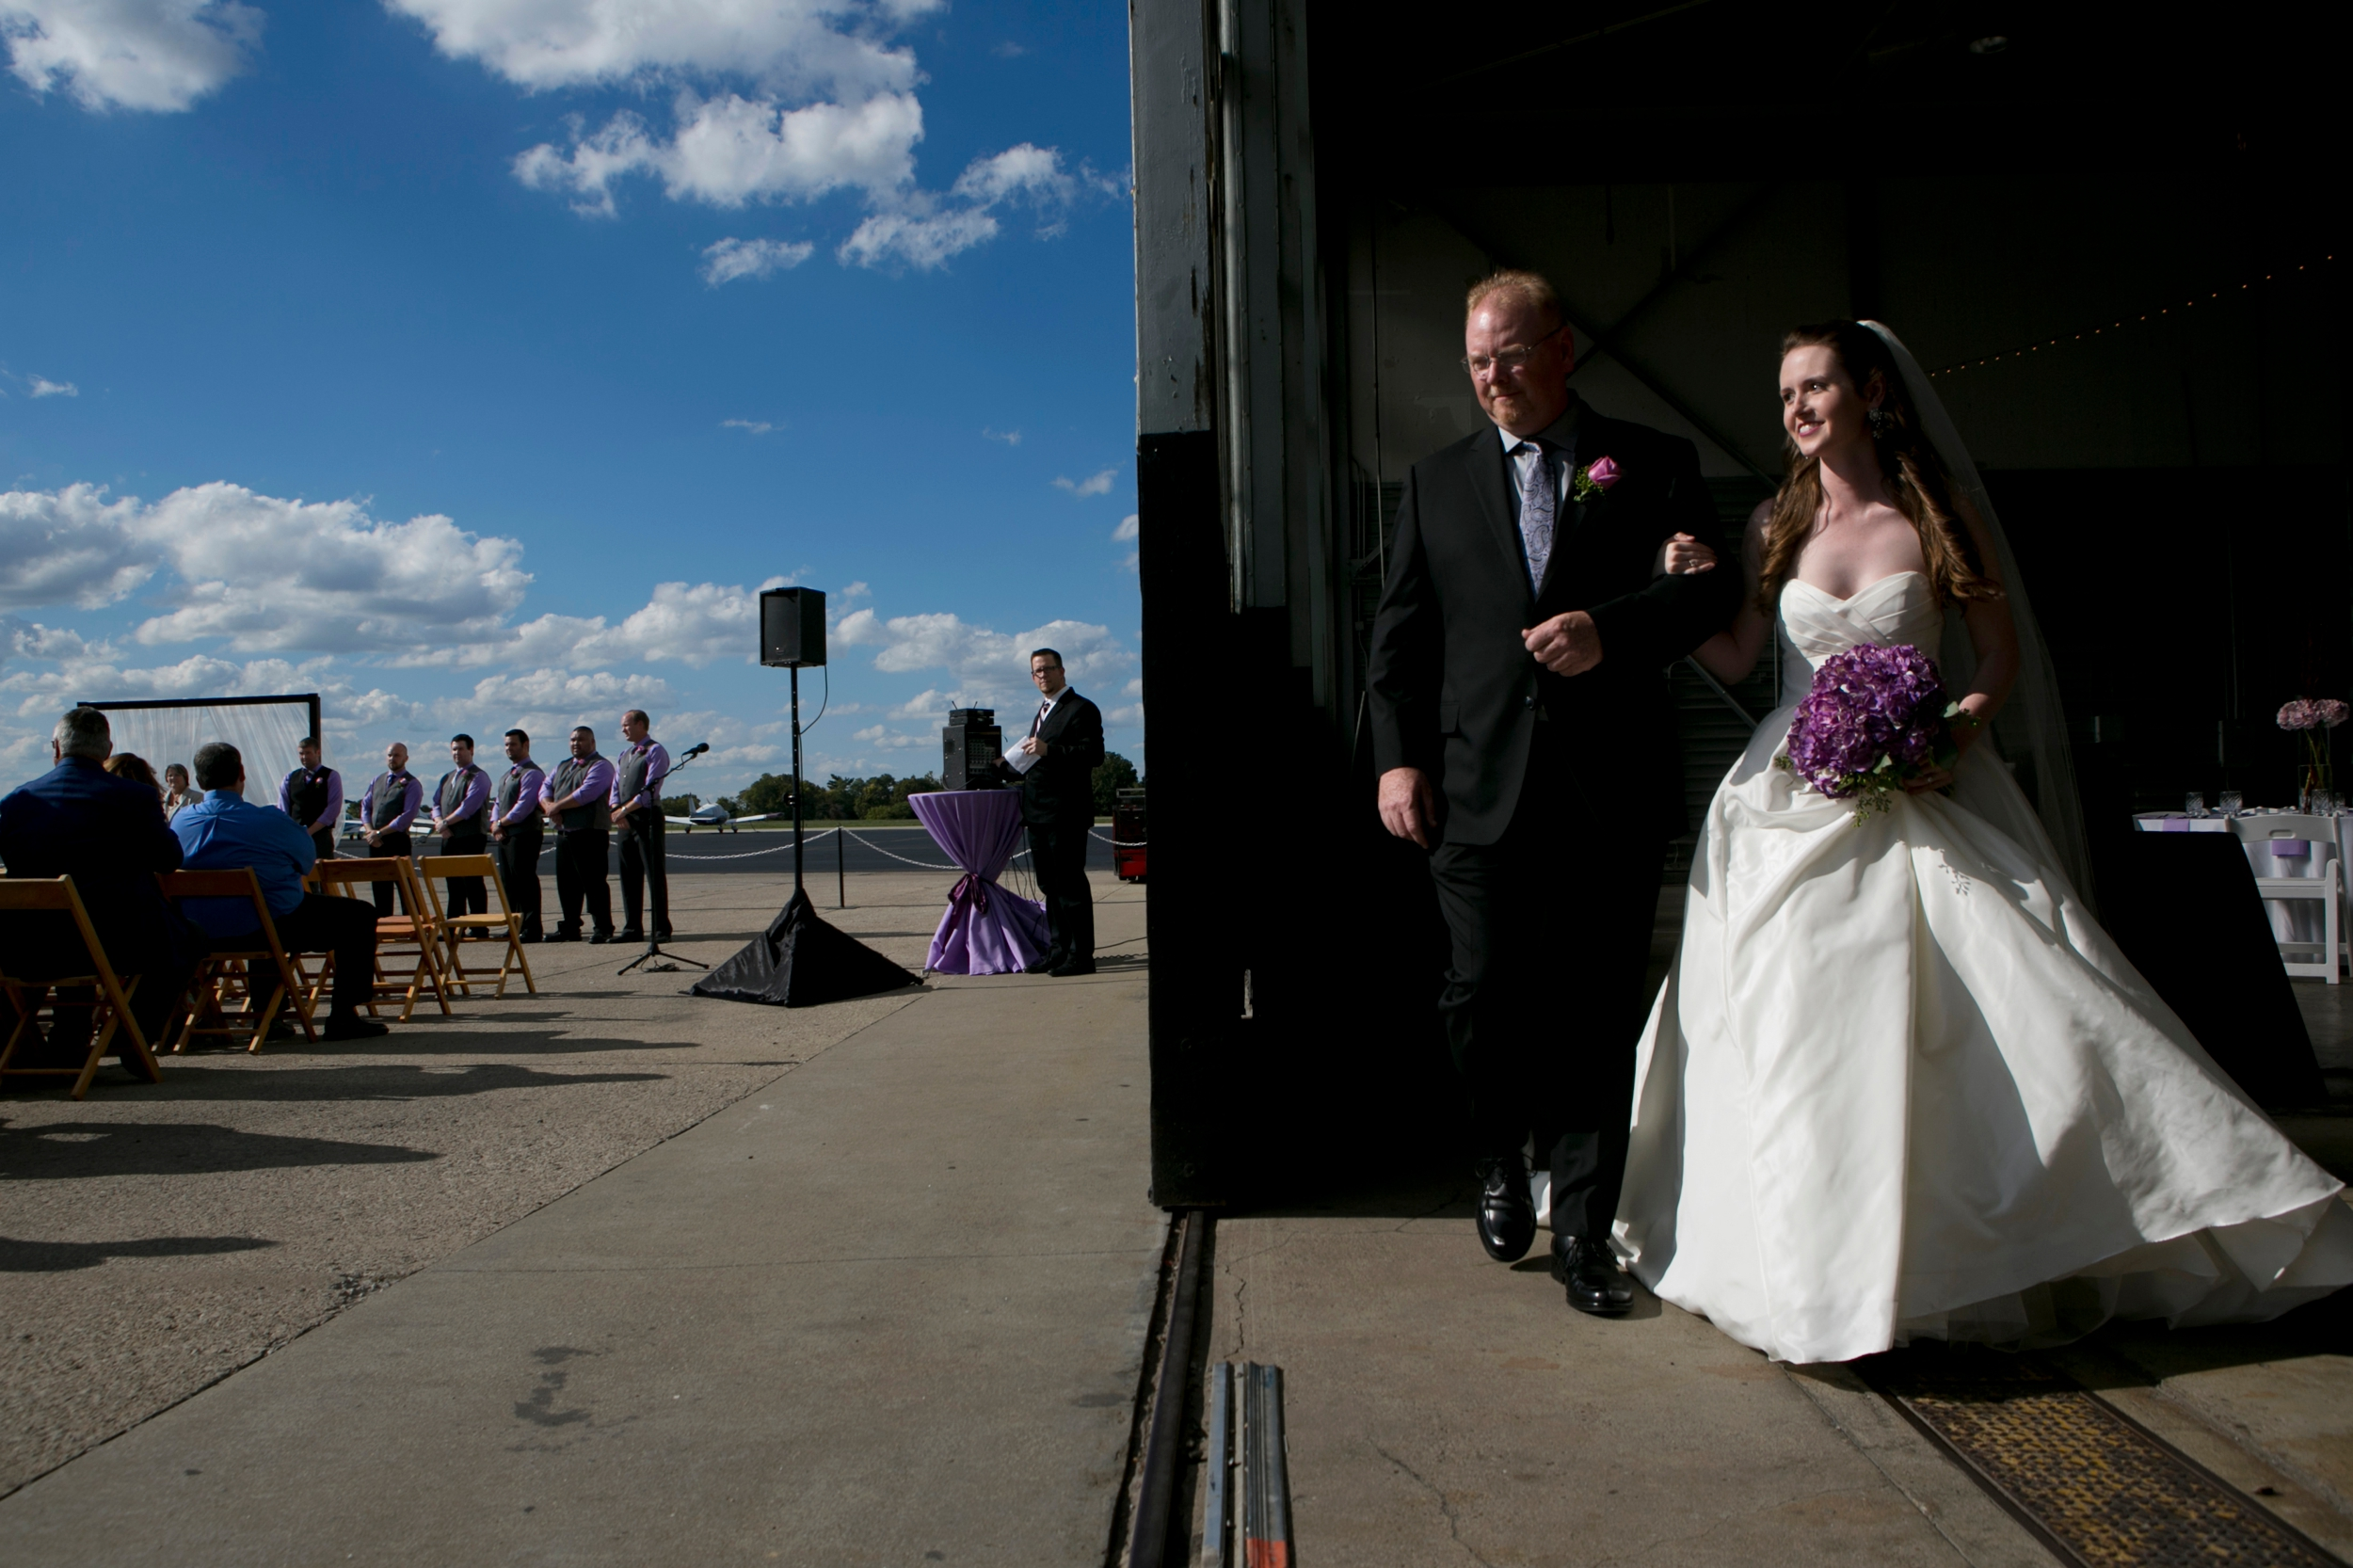 40-bowman-field-wedding.JPG